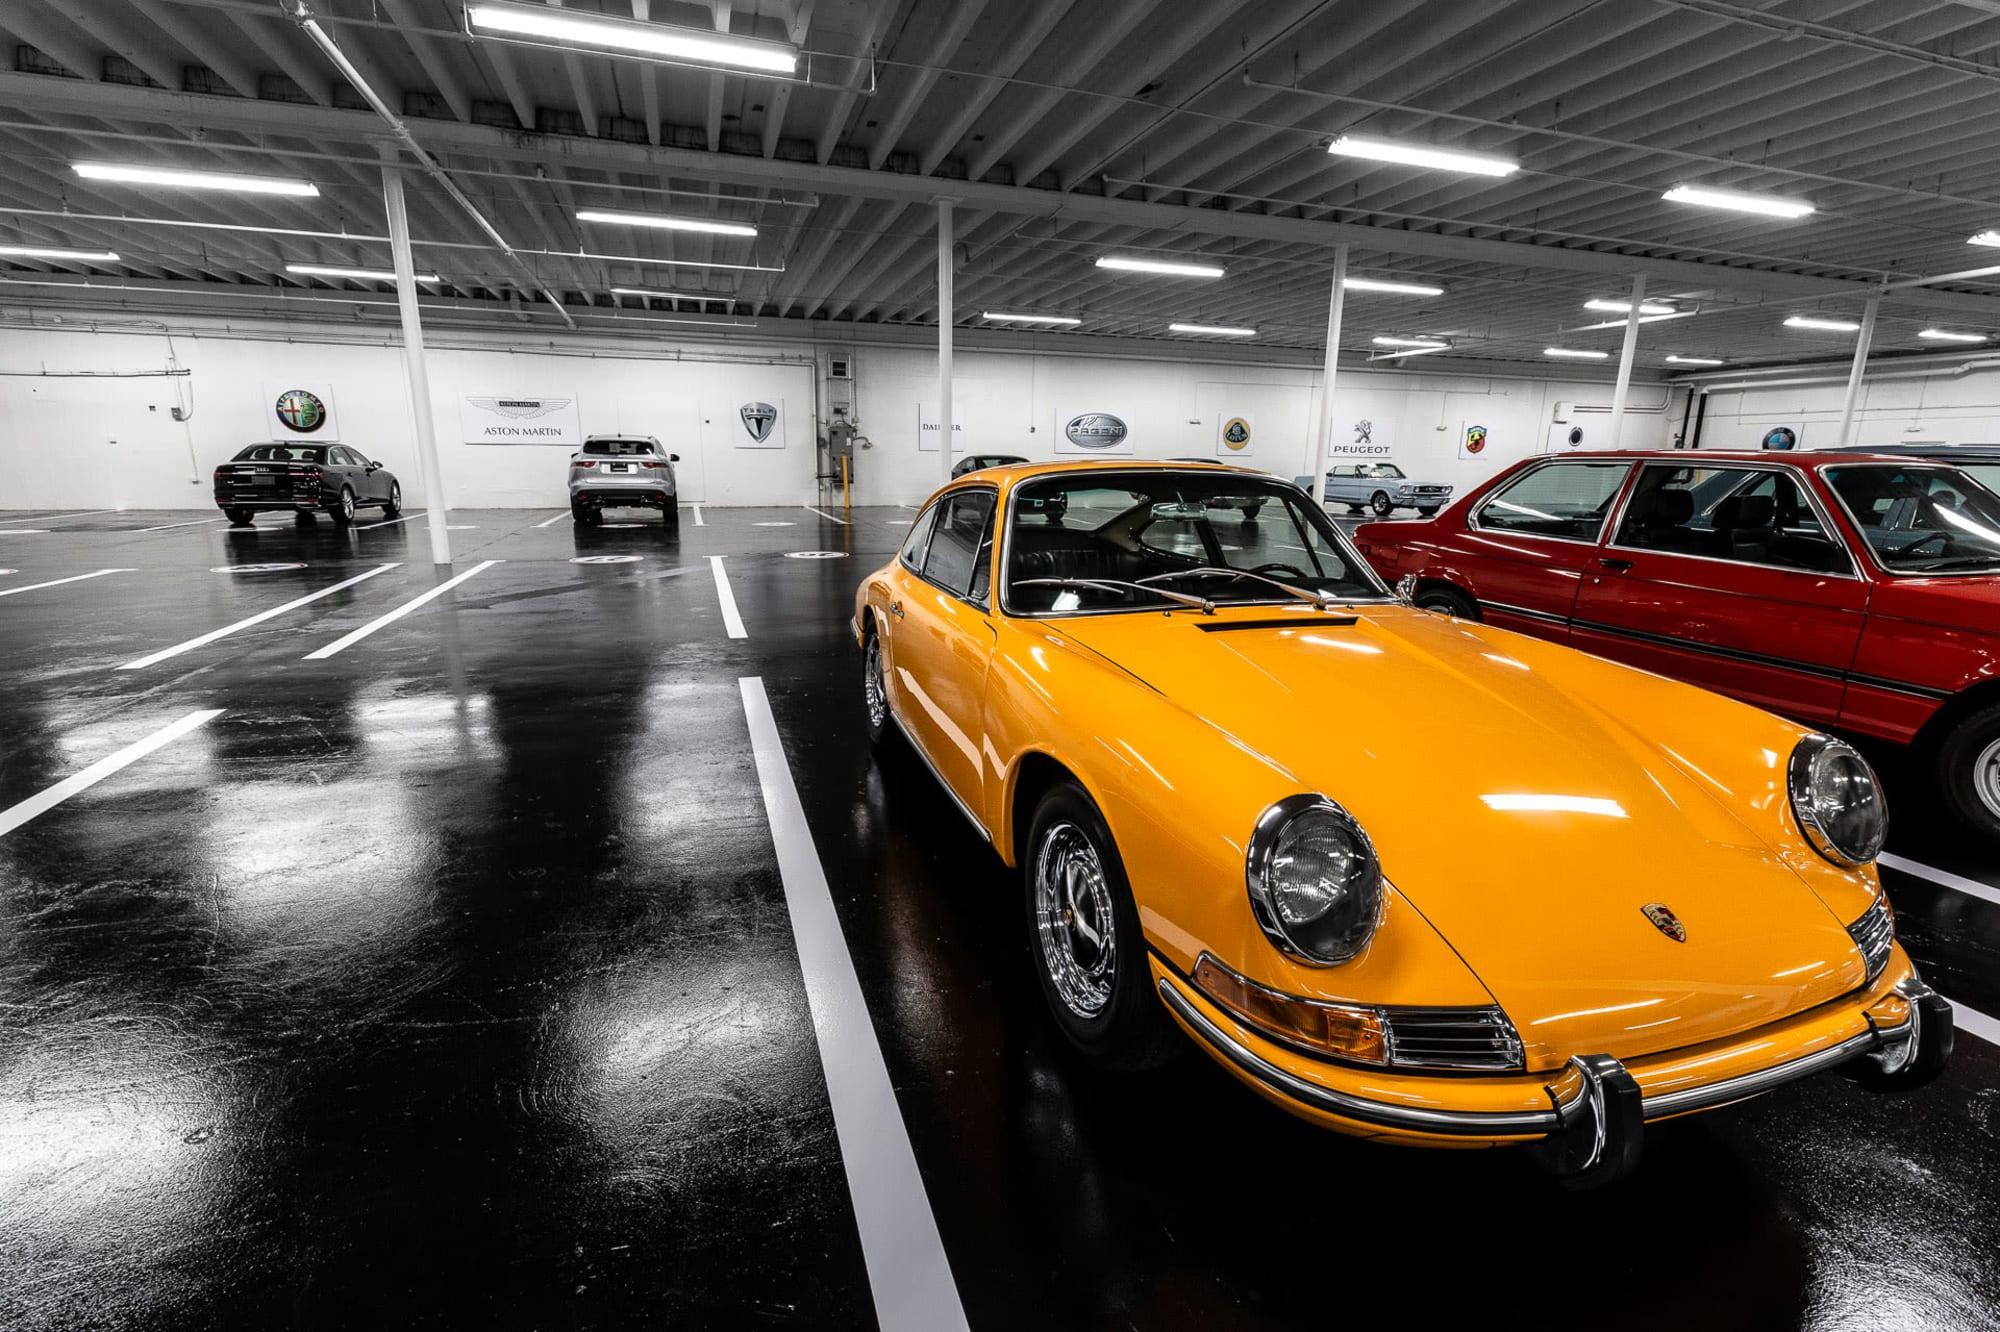 An alternate view of a Porsche sports car at Premier Car Storage in Miami, Florida